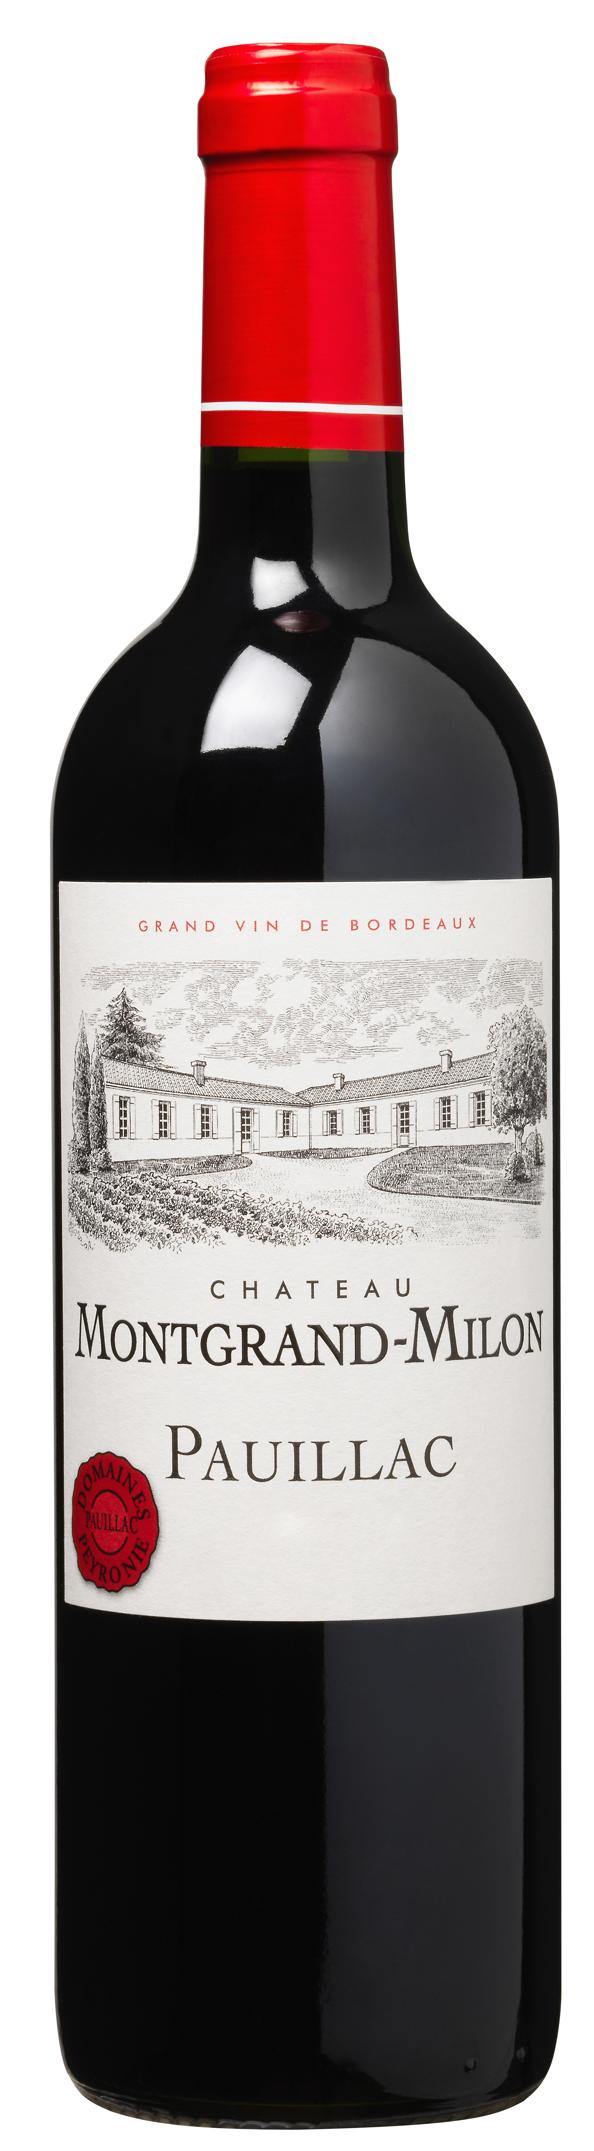 Château Montgrand-Milon, Pauillac 2014